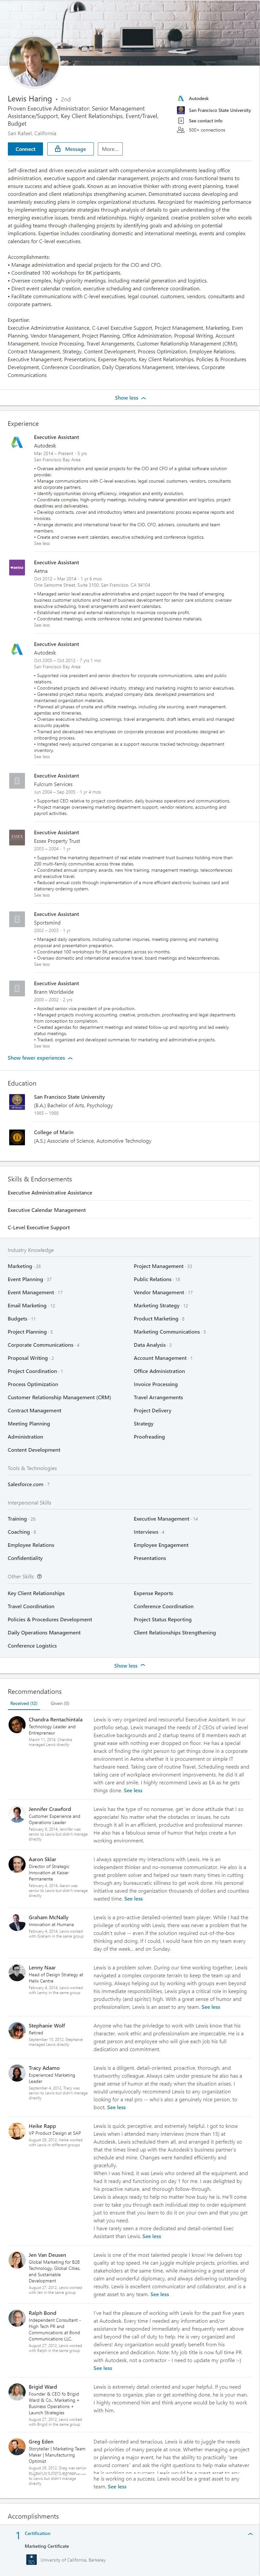 Linkedin Profile example office manager secretary 2376